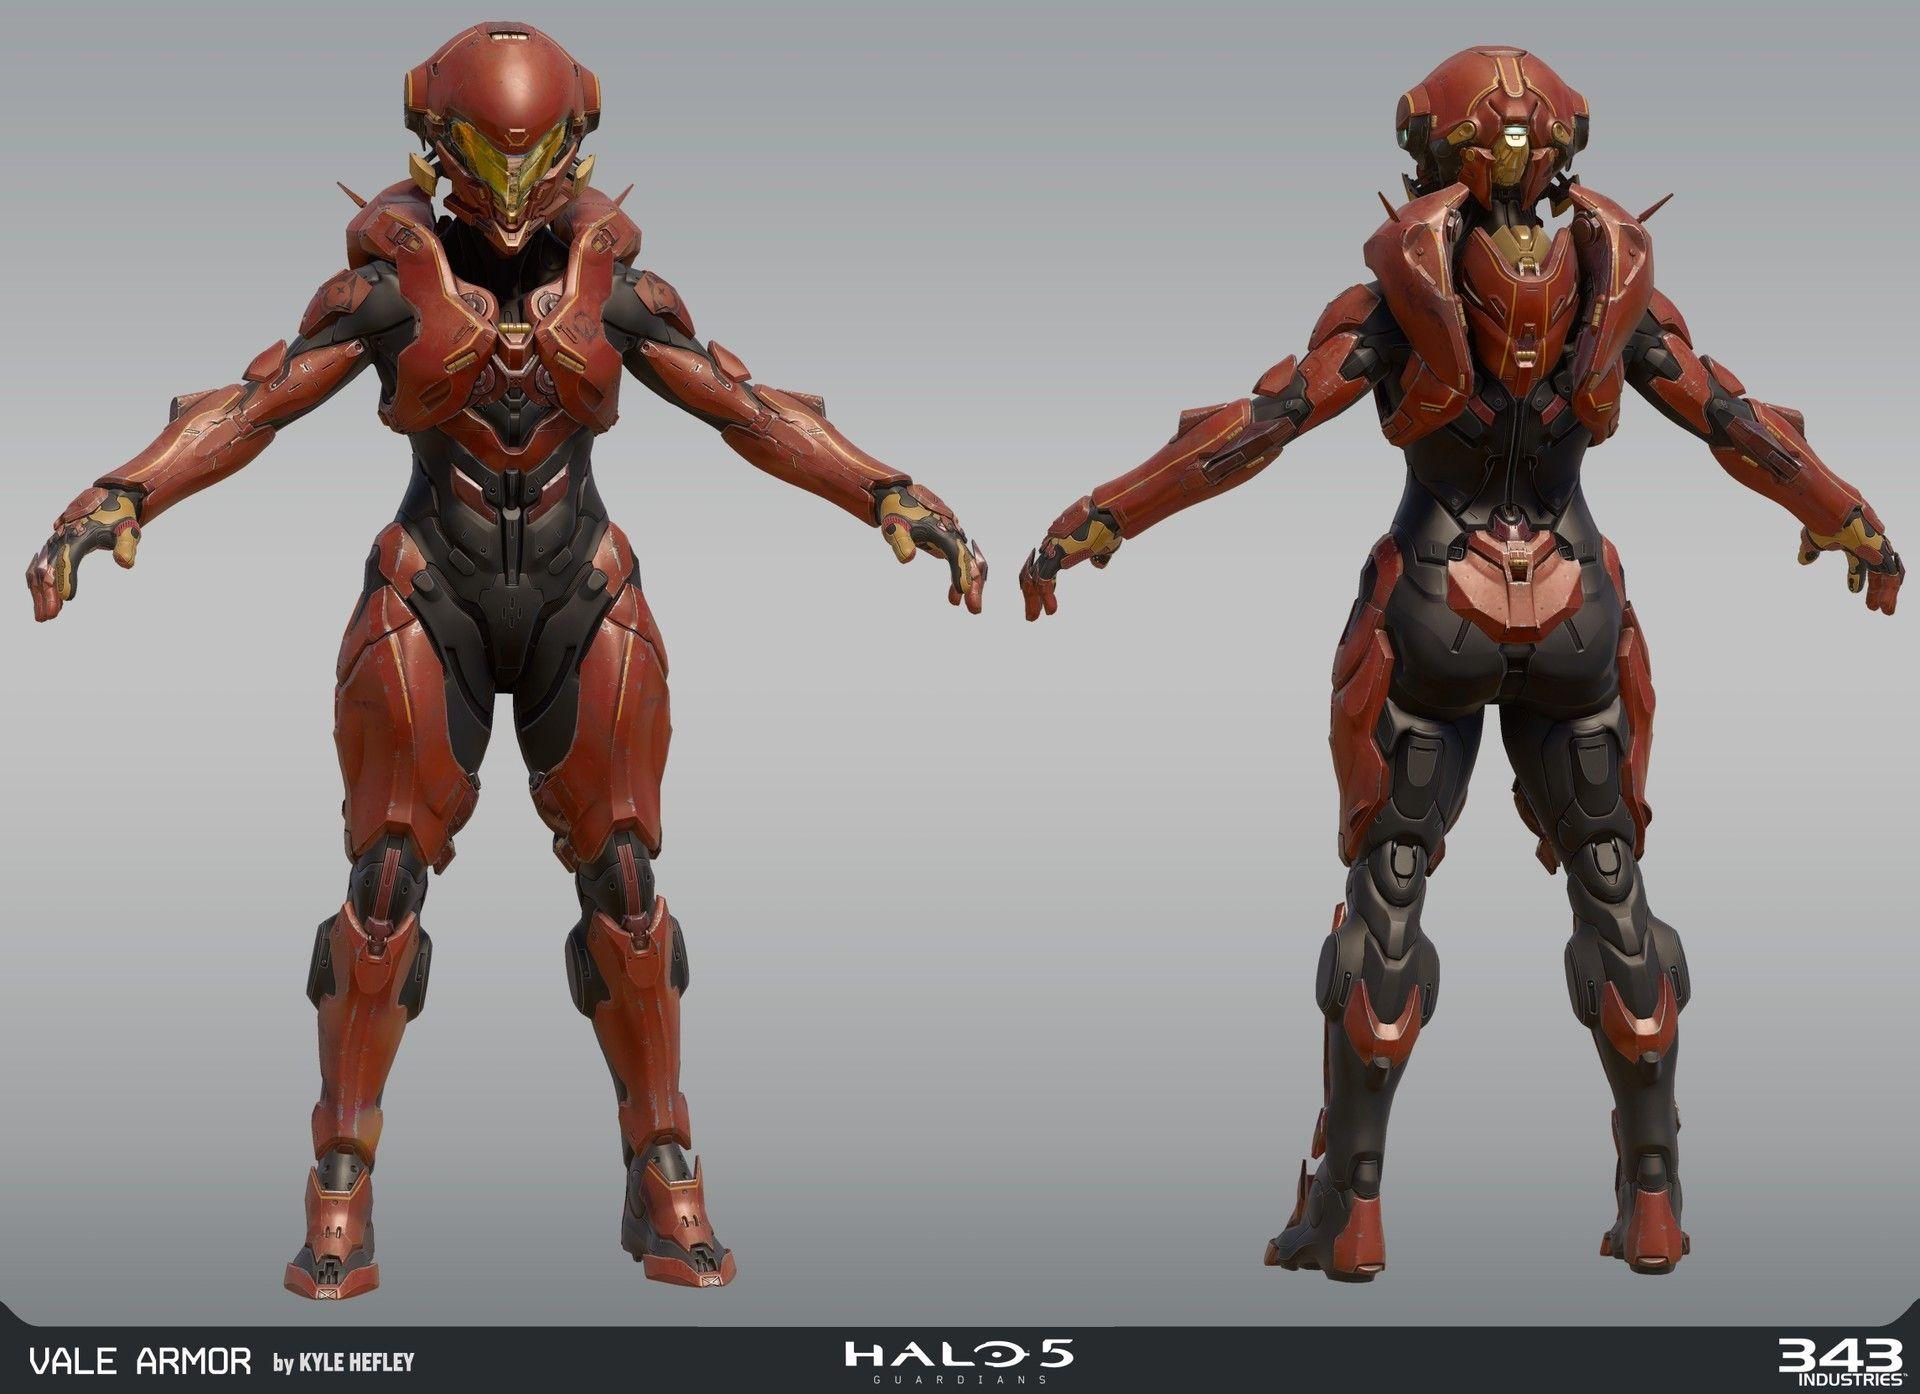 ArtStation - Halo 5 - Vale, Kyle Hefley | Sci-Fi & Concept Art ...